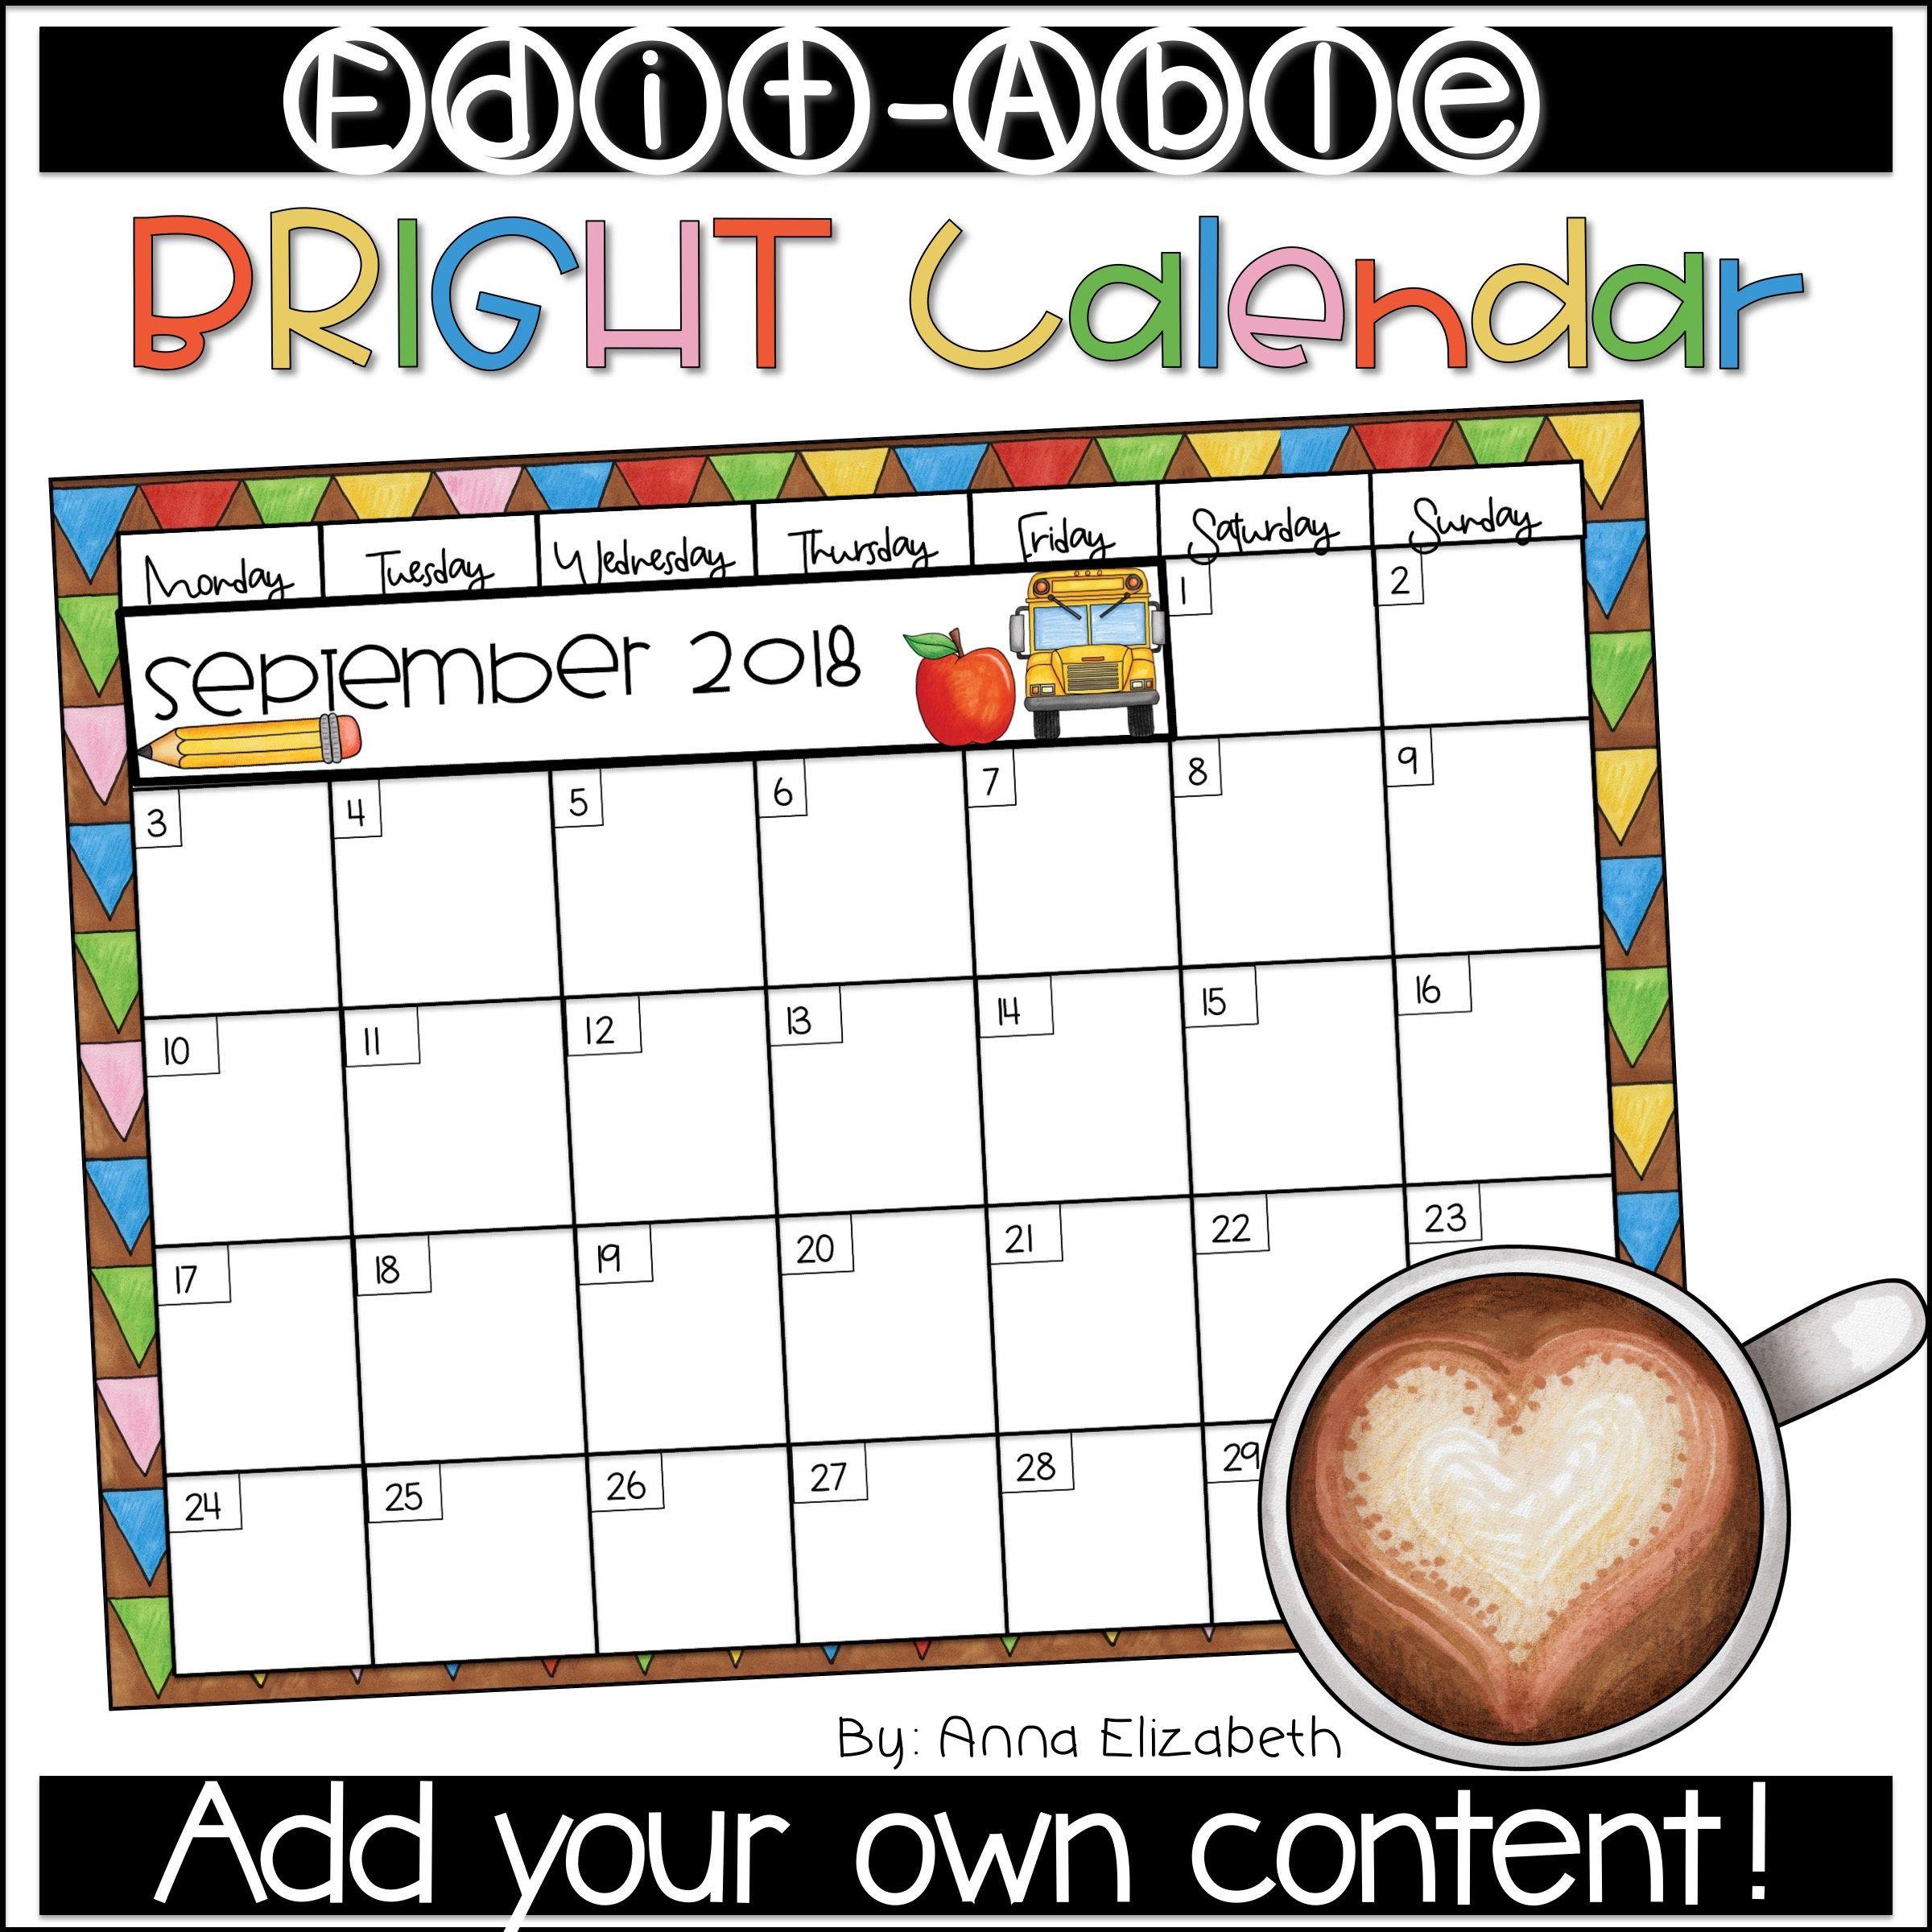 Editable Calendar 20202021 Etsy in 2020 Editable